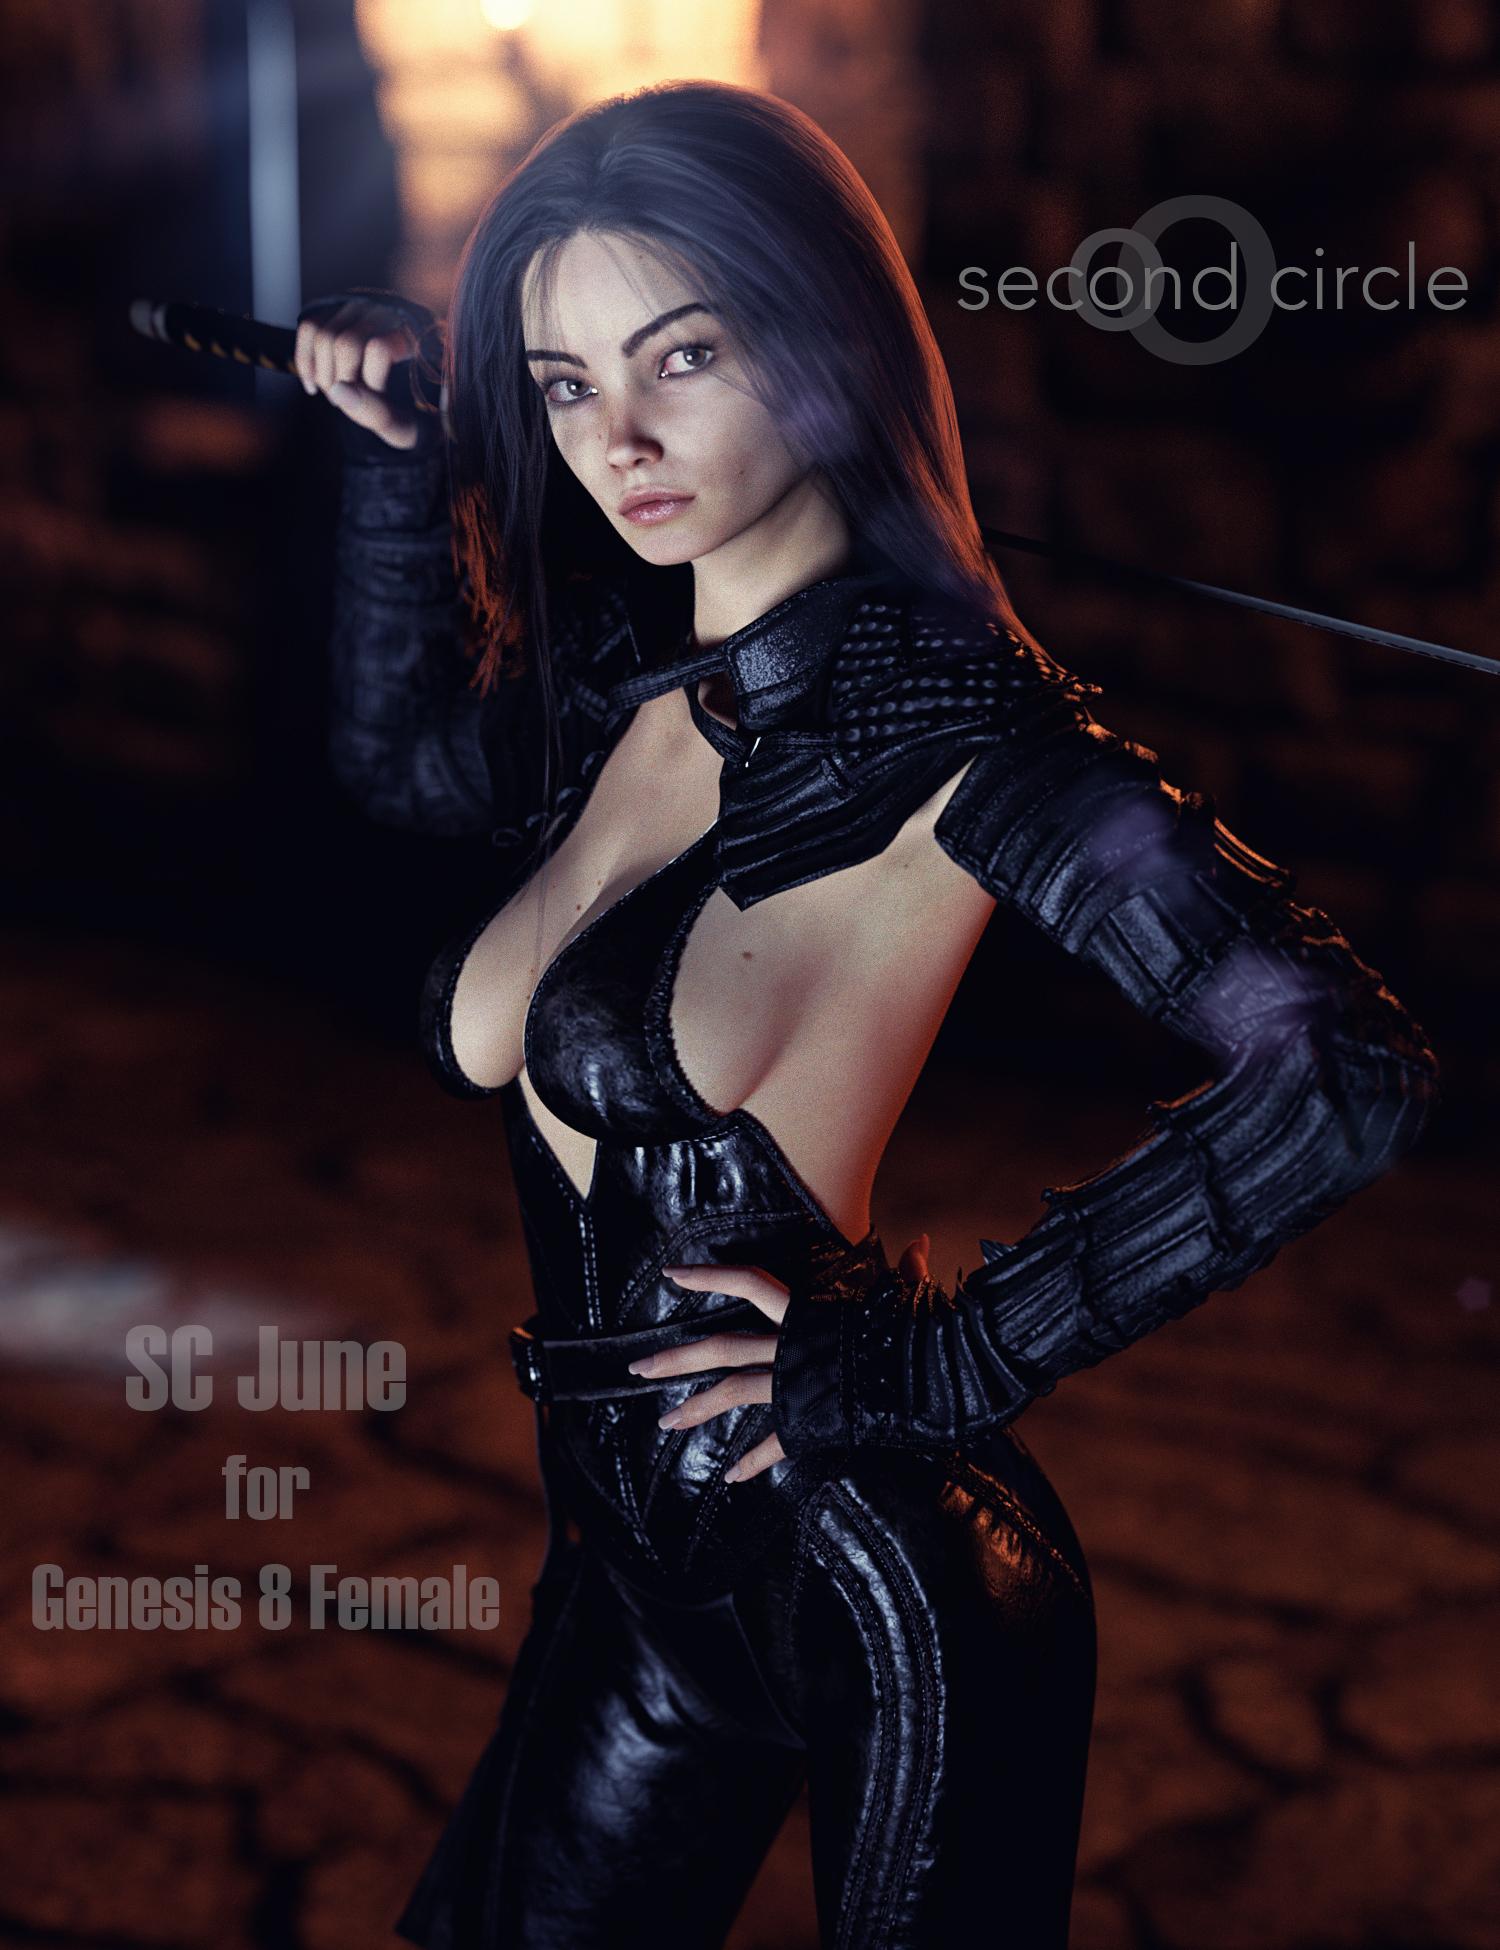 SC June for Genesis 8 Female